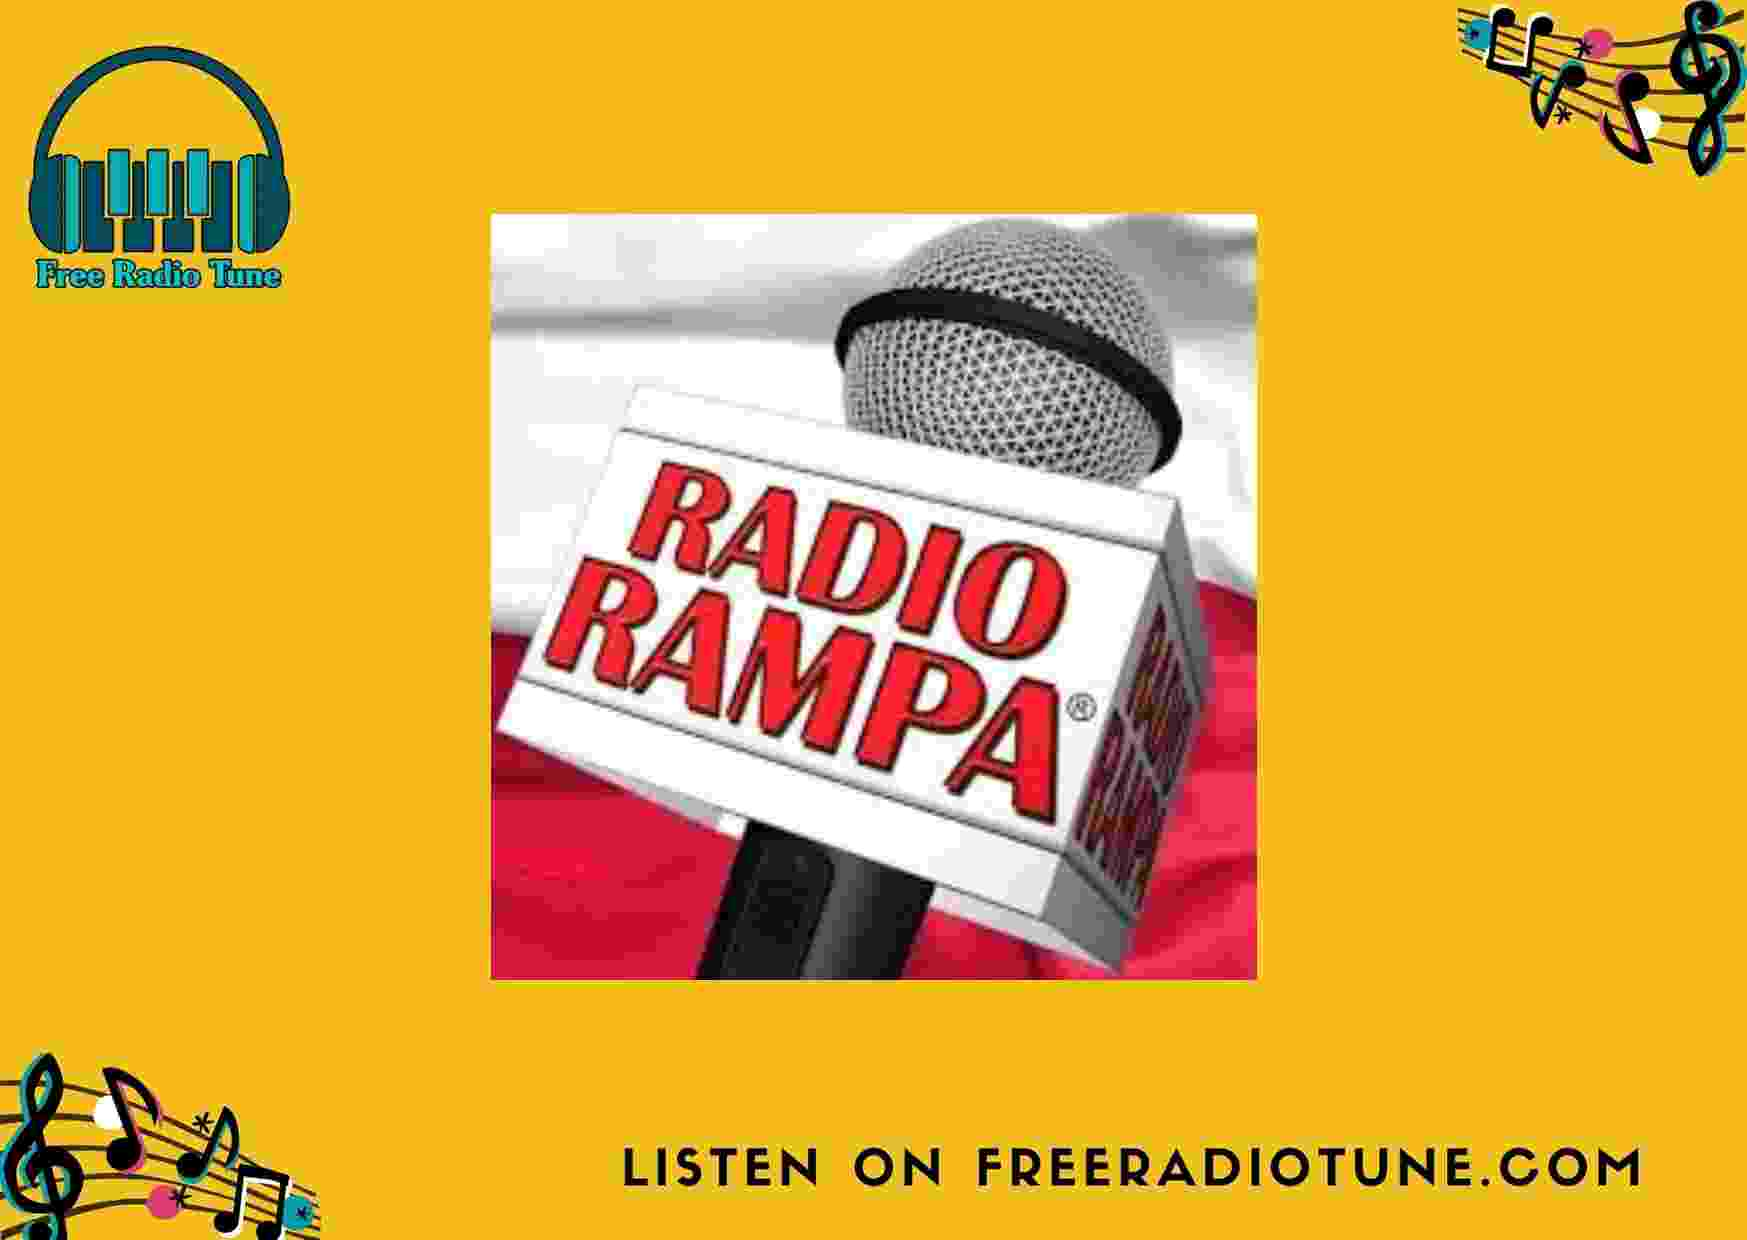 Radio Rampa Listen Live for free